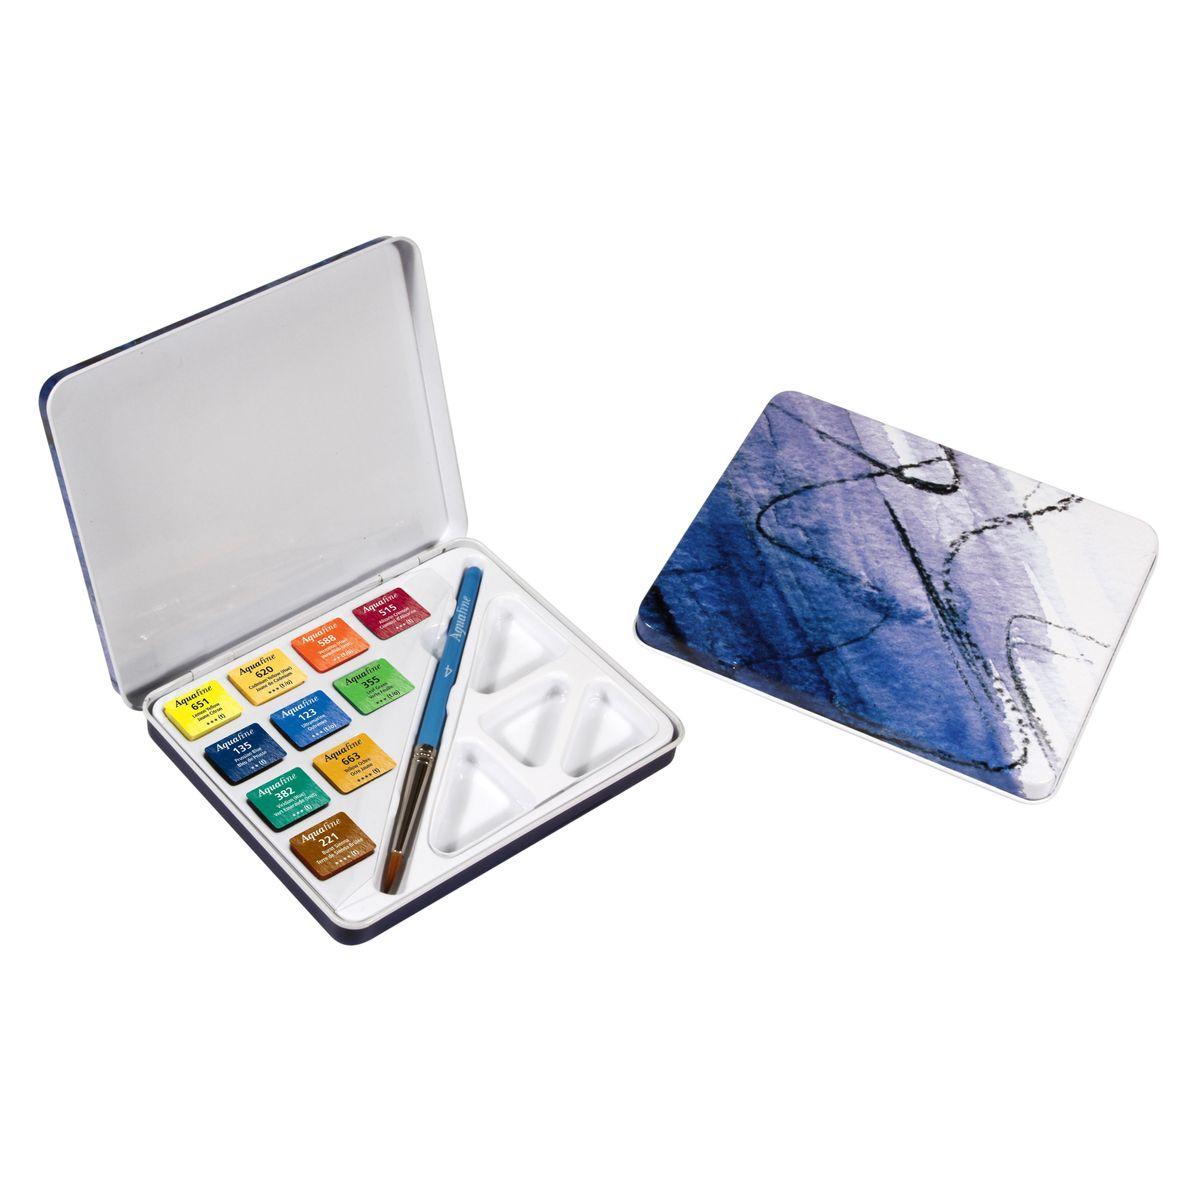 Aquarela em Pastilha Profissional Daler Rowney - Lata com 10 cores